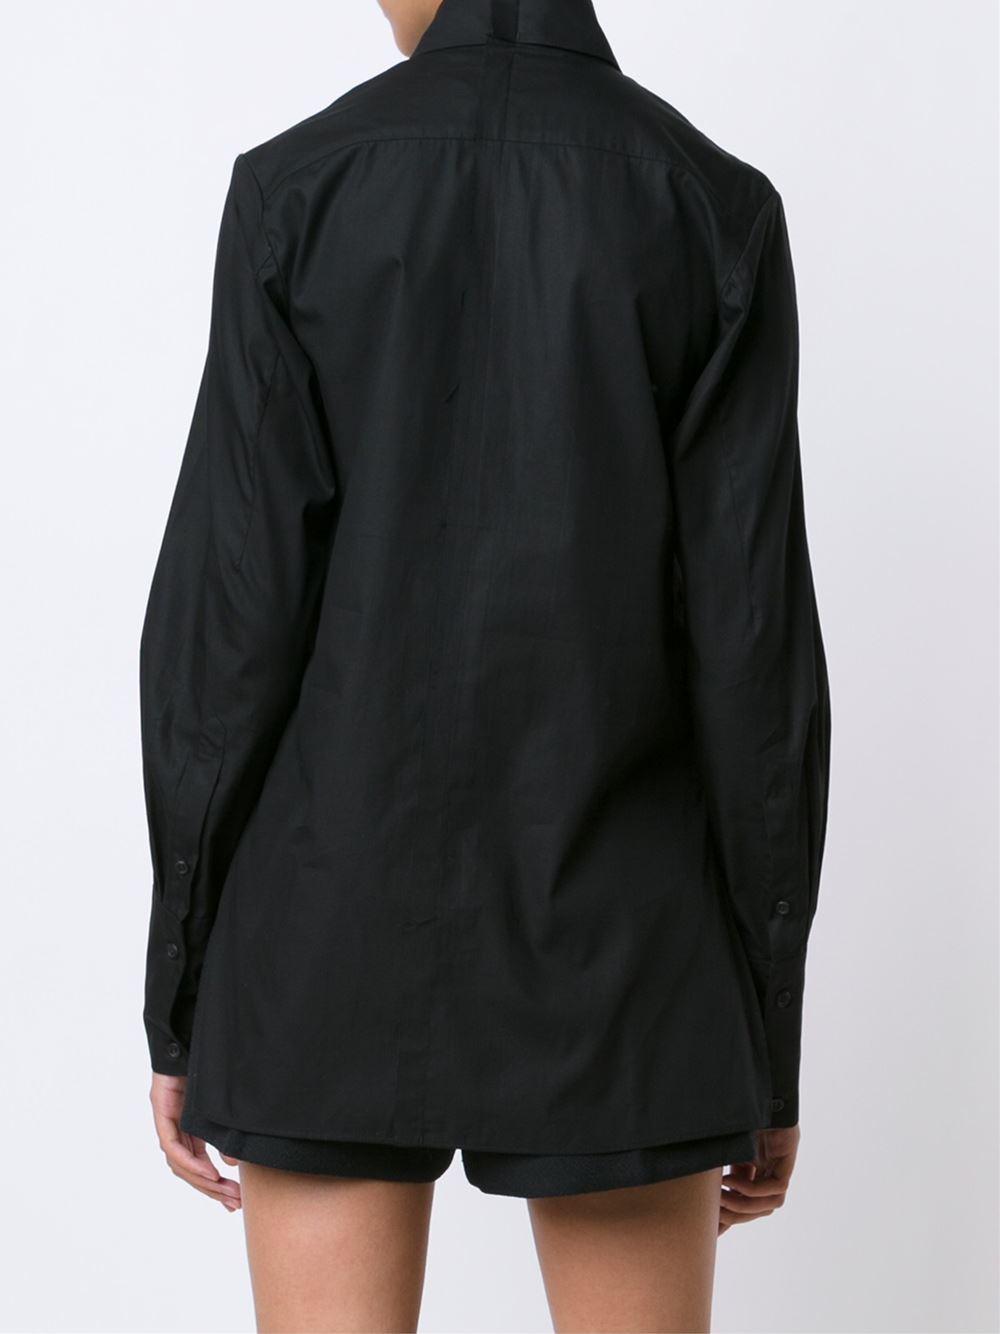 Lyst yang li soft dress shirt women cotton 40 in for Soft cotton dress shirts